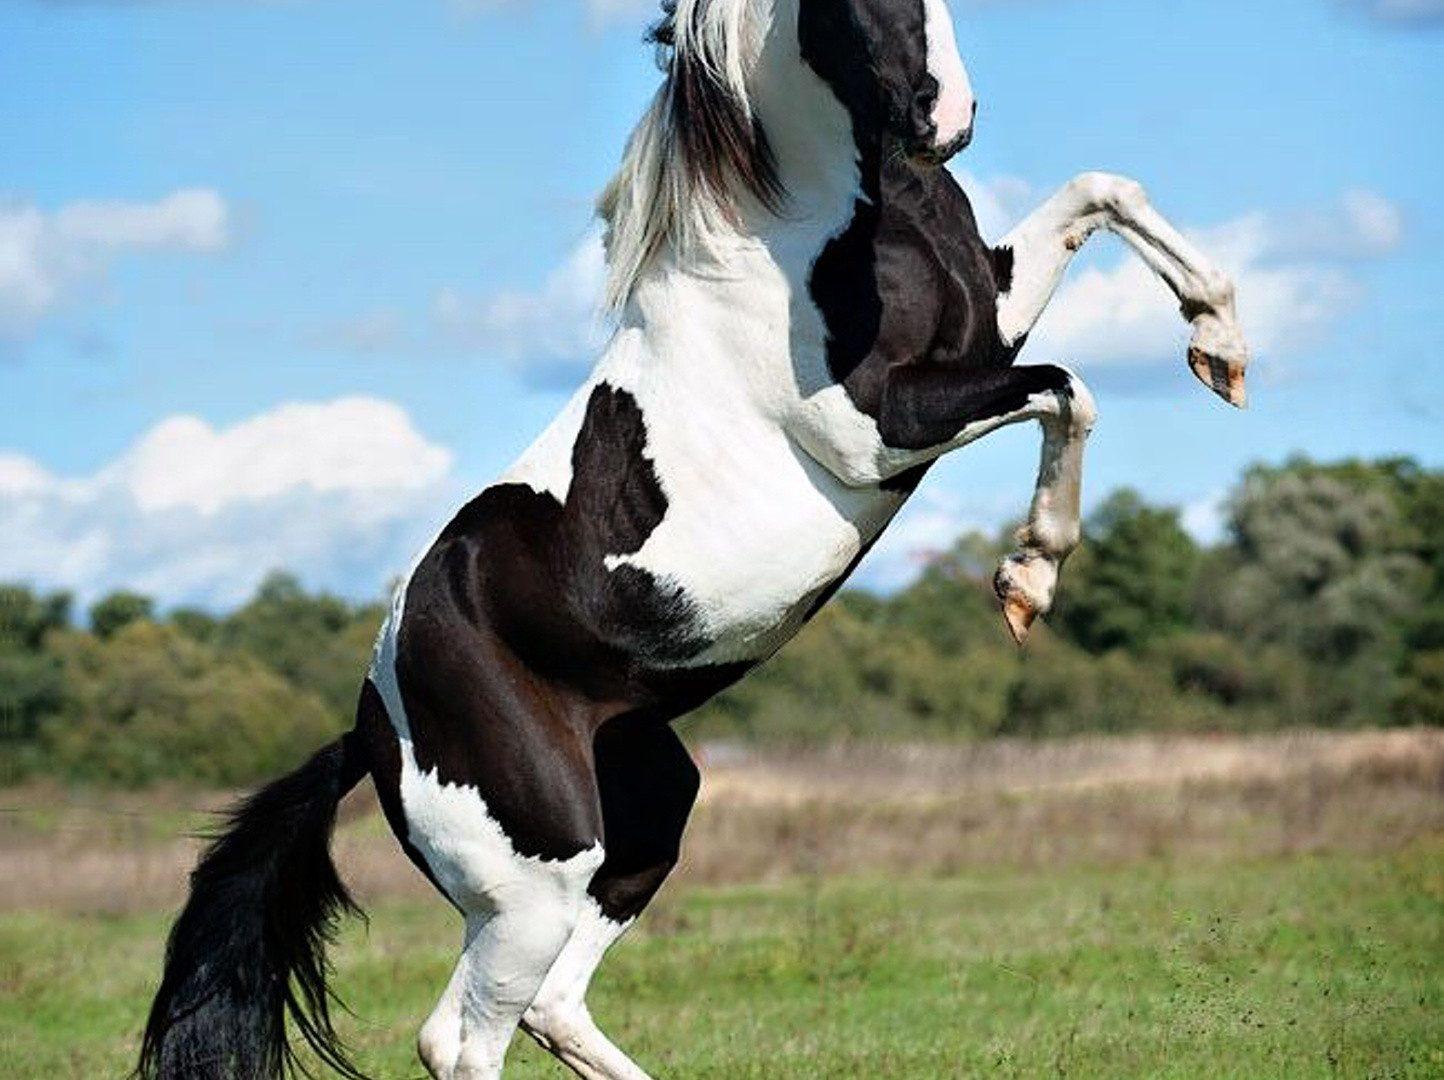 Beautiful Black White Horse Download Wallpapers Black And White Horse Rearing 1894363 Hd Wallpaper Backgrounds Download